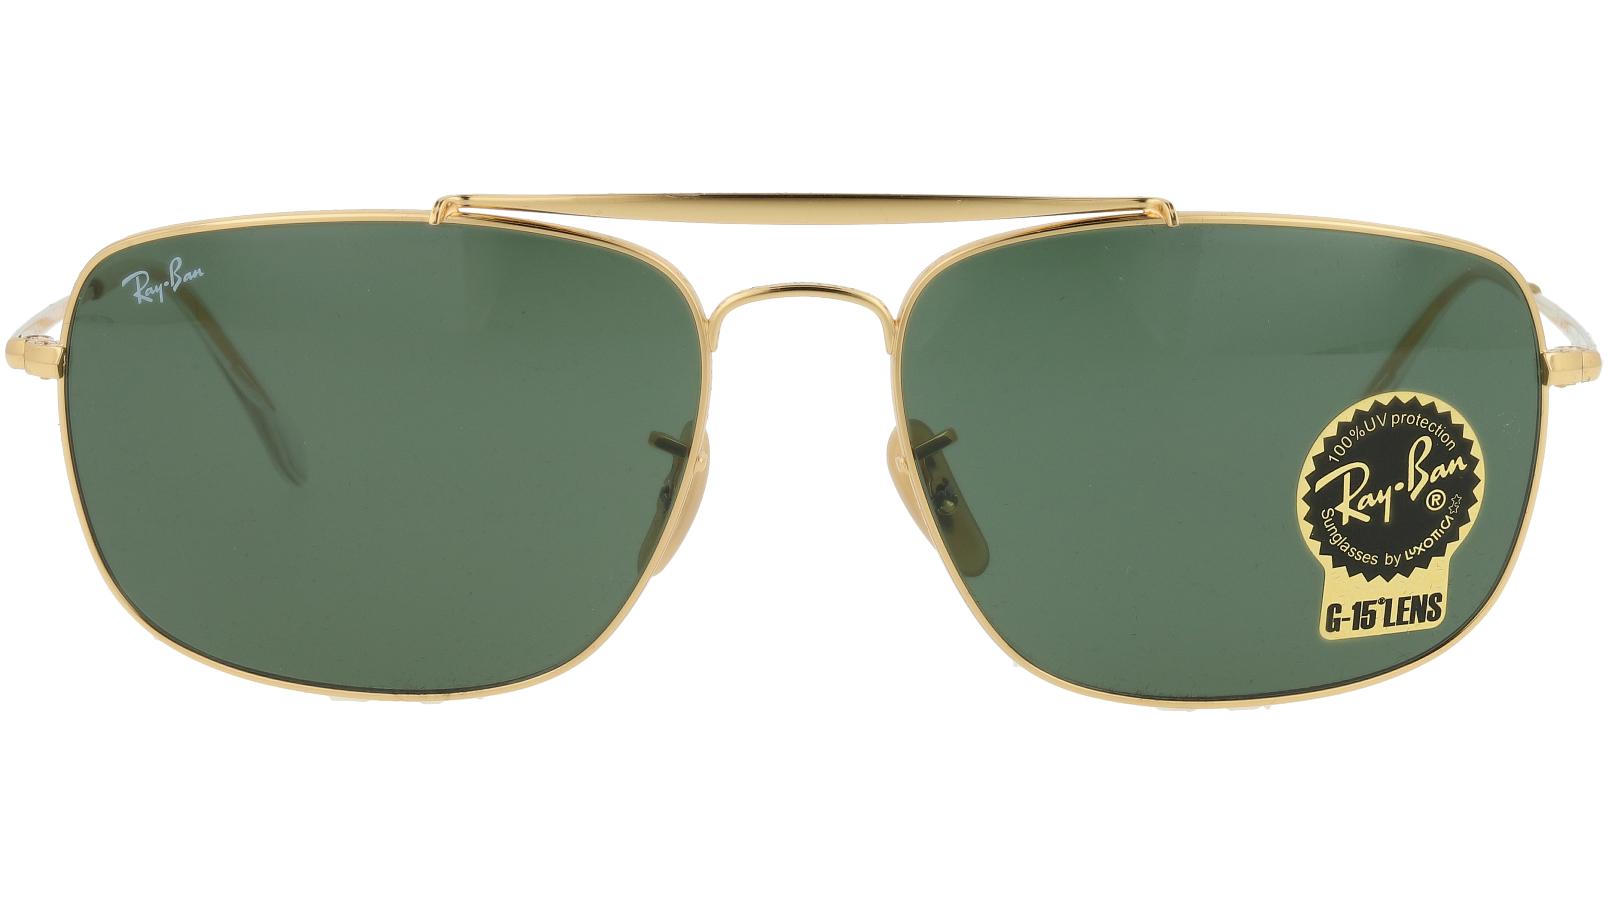 Ray-Ban RB3560 001 61 ARISTA Sunglasses